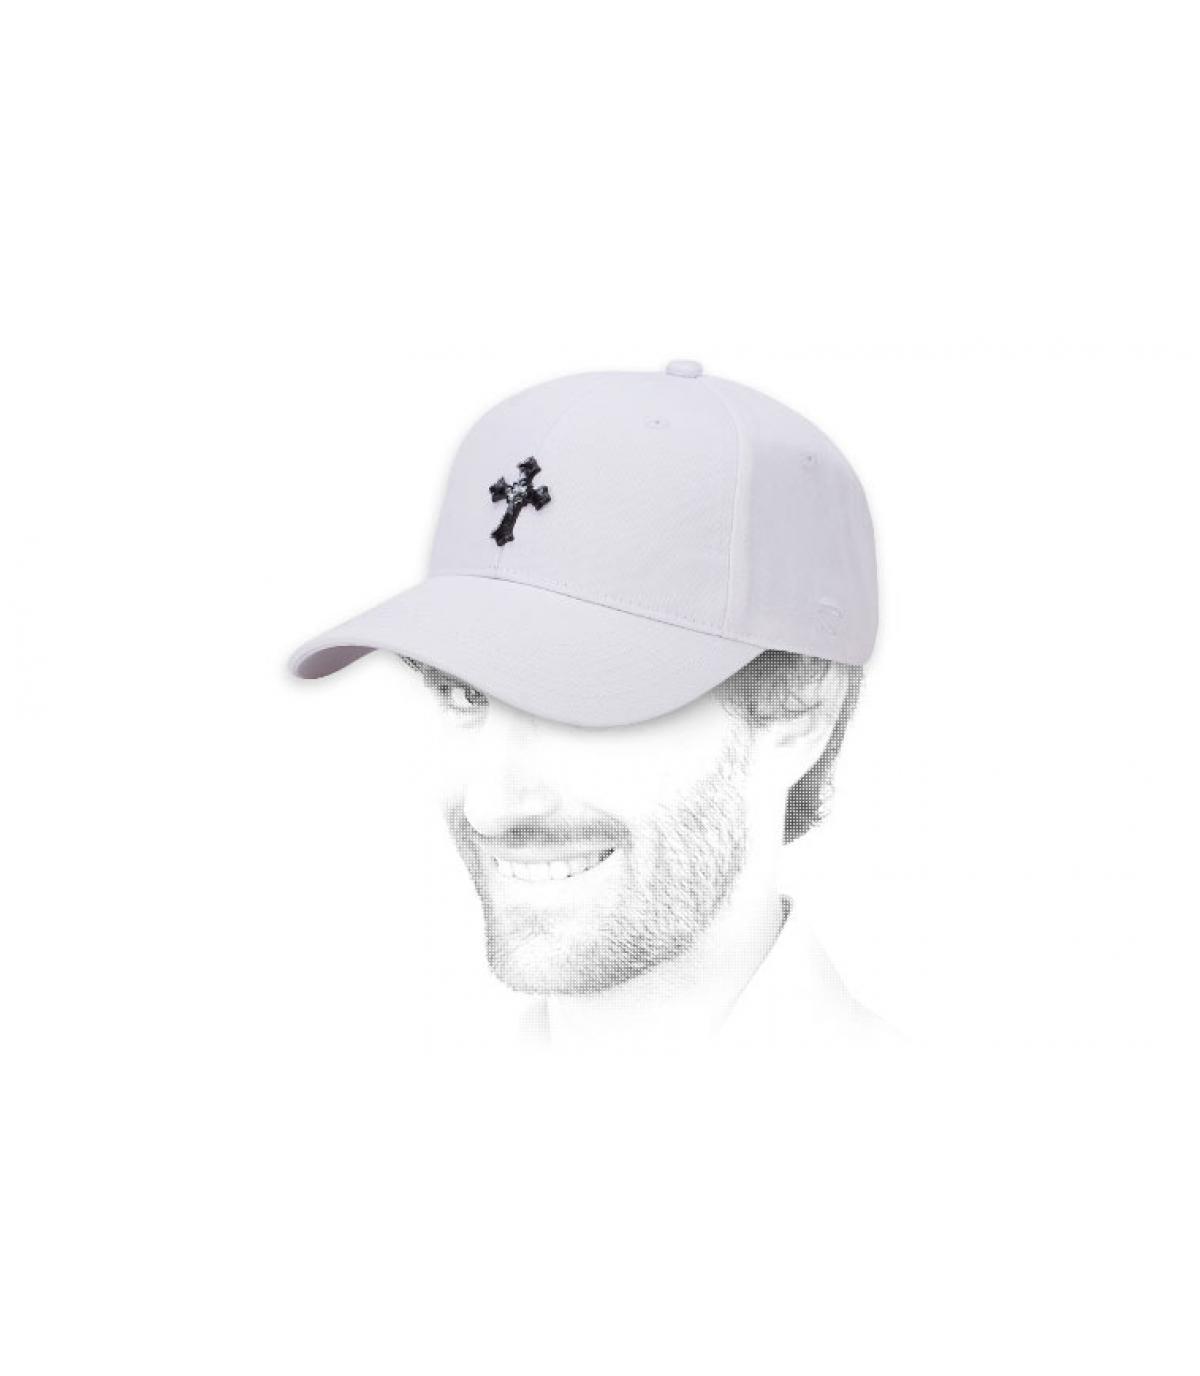 white Marley cap